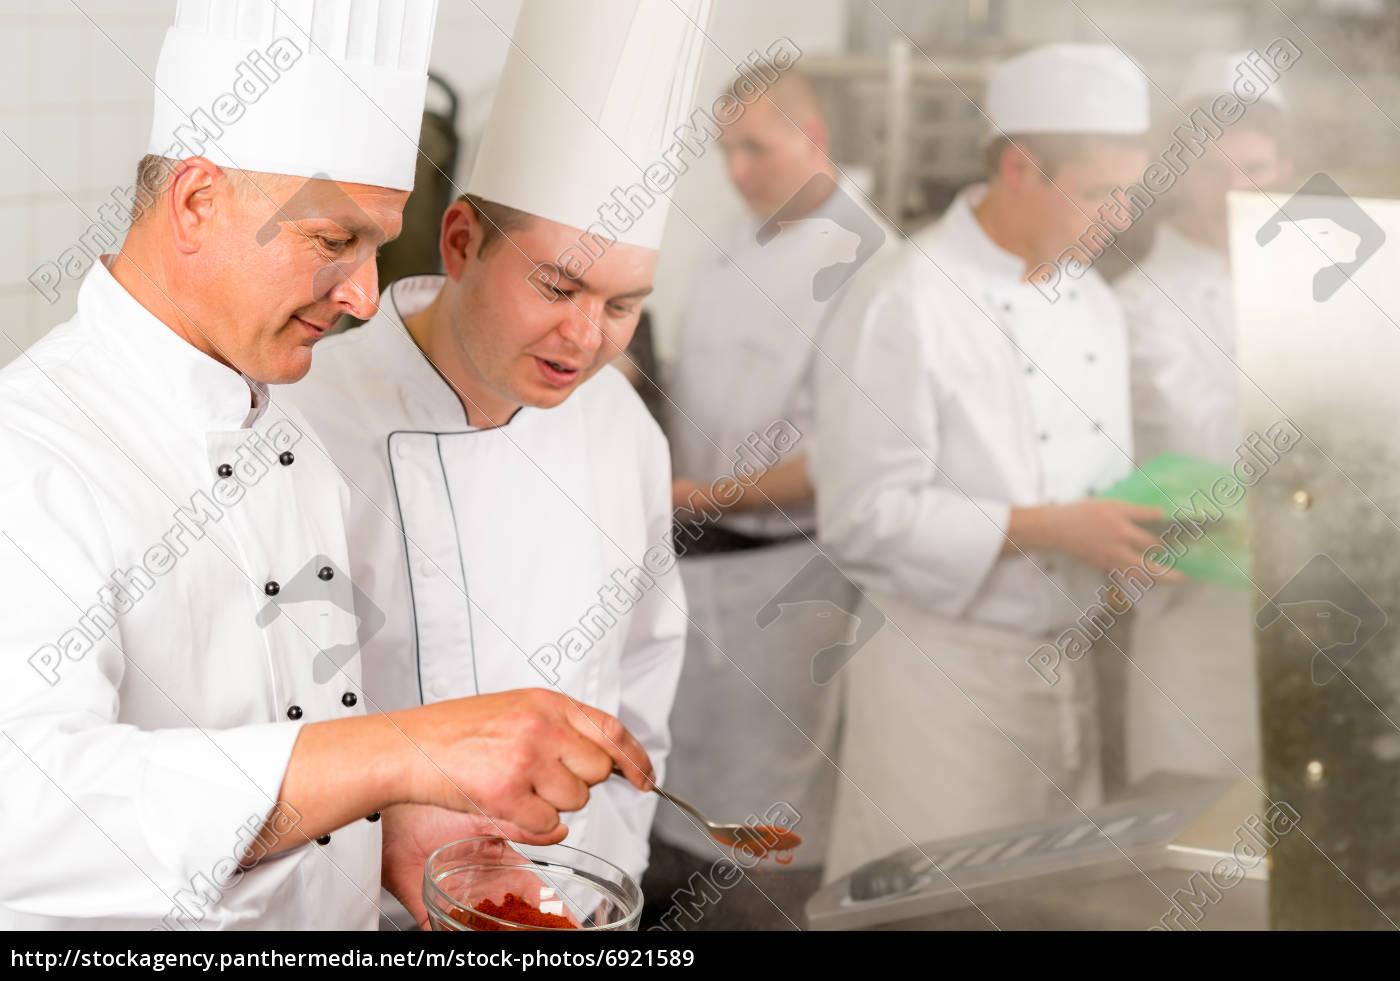 profi-küche küchenchef würzen lebensmittel - lizenzfreies bild